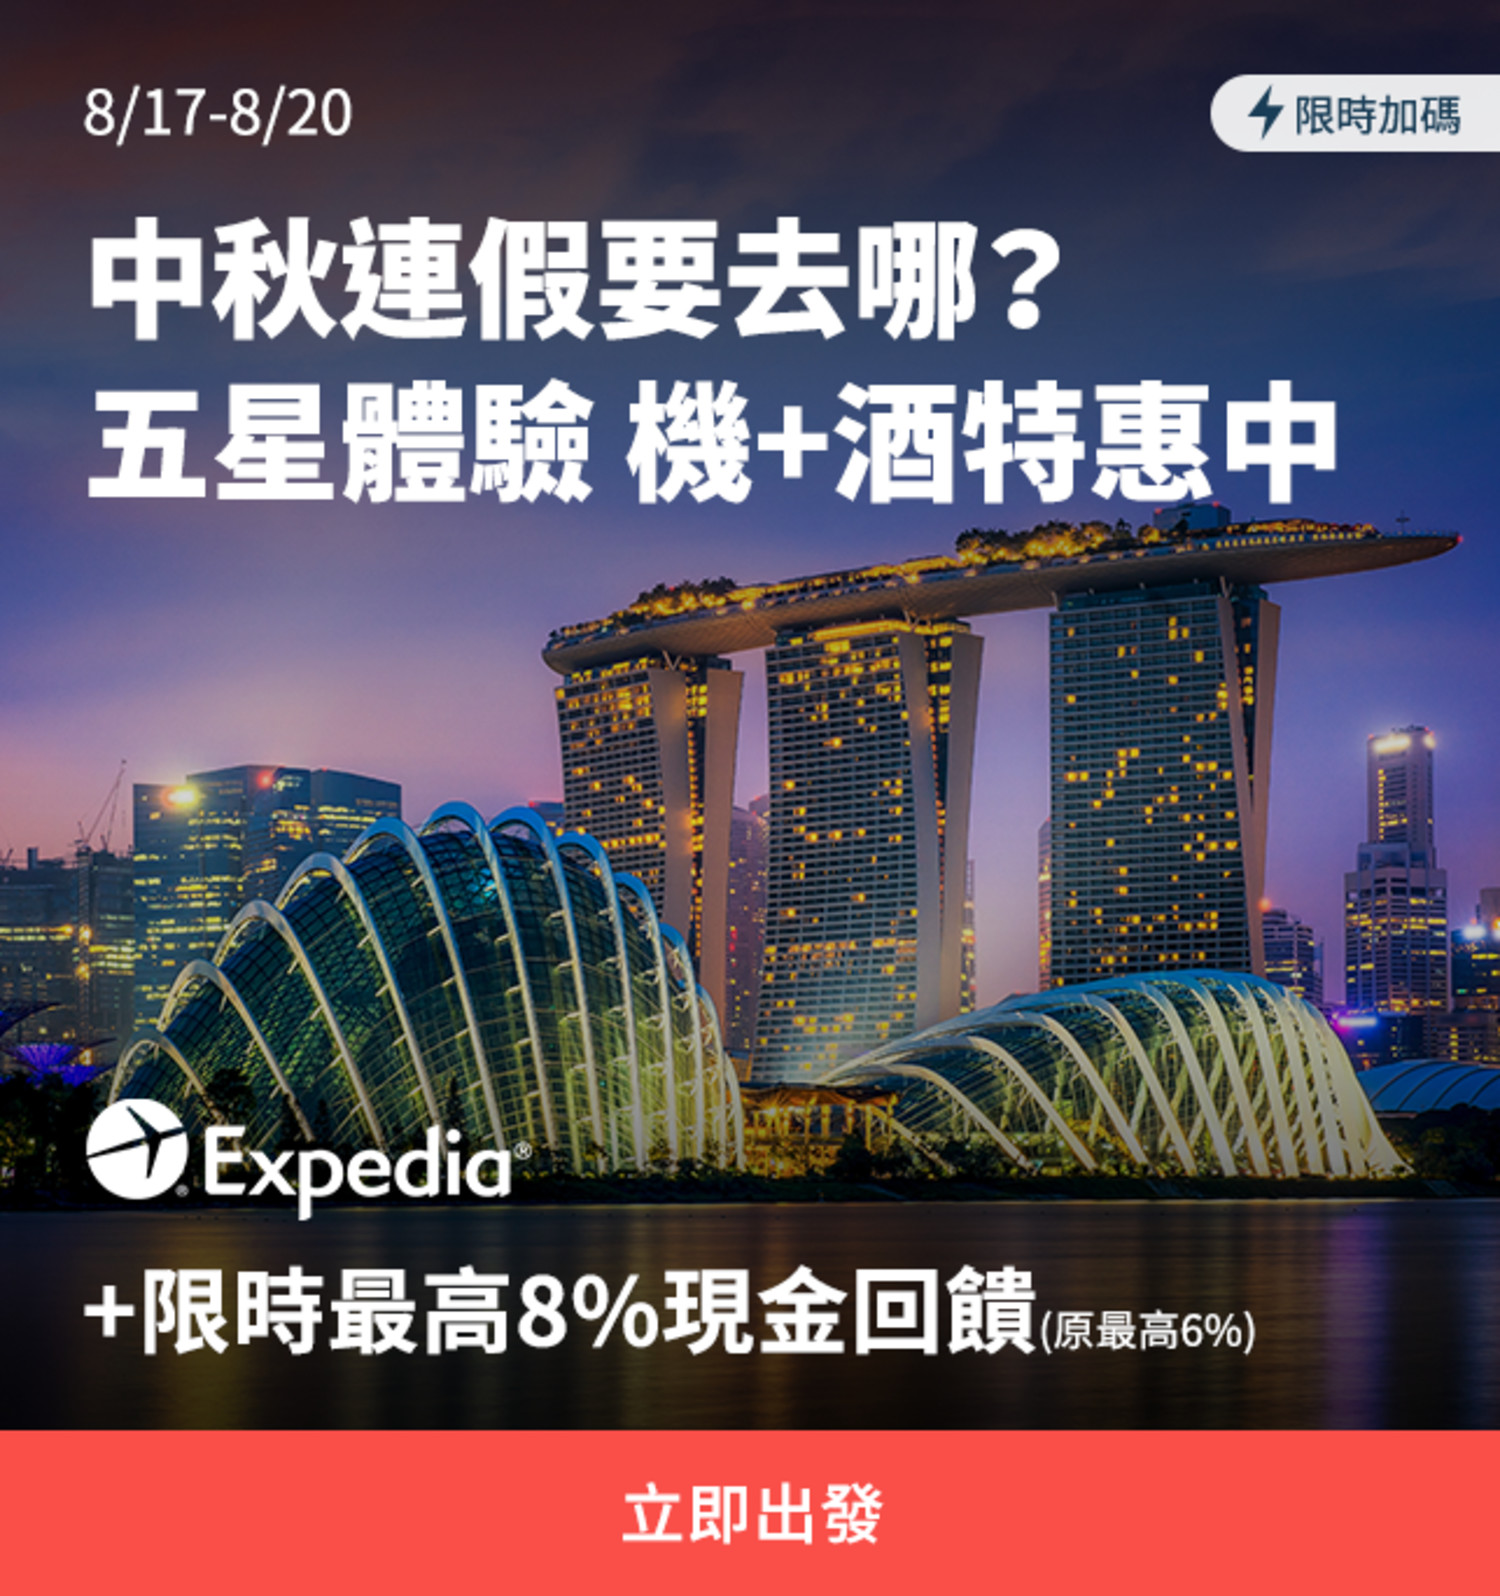 expedia 加碼最高8% 0817-0820